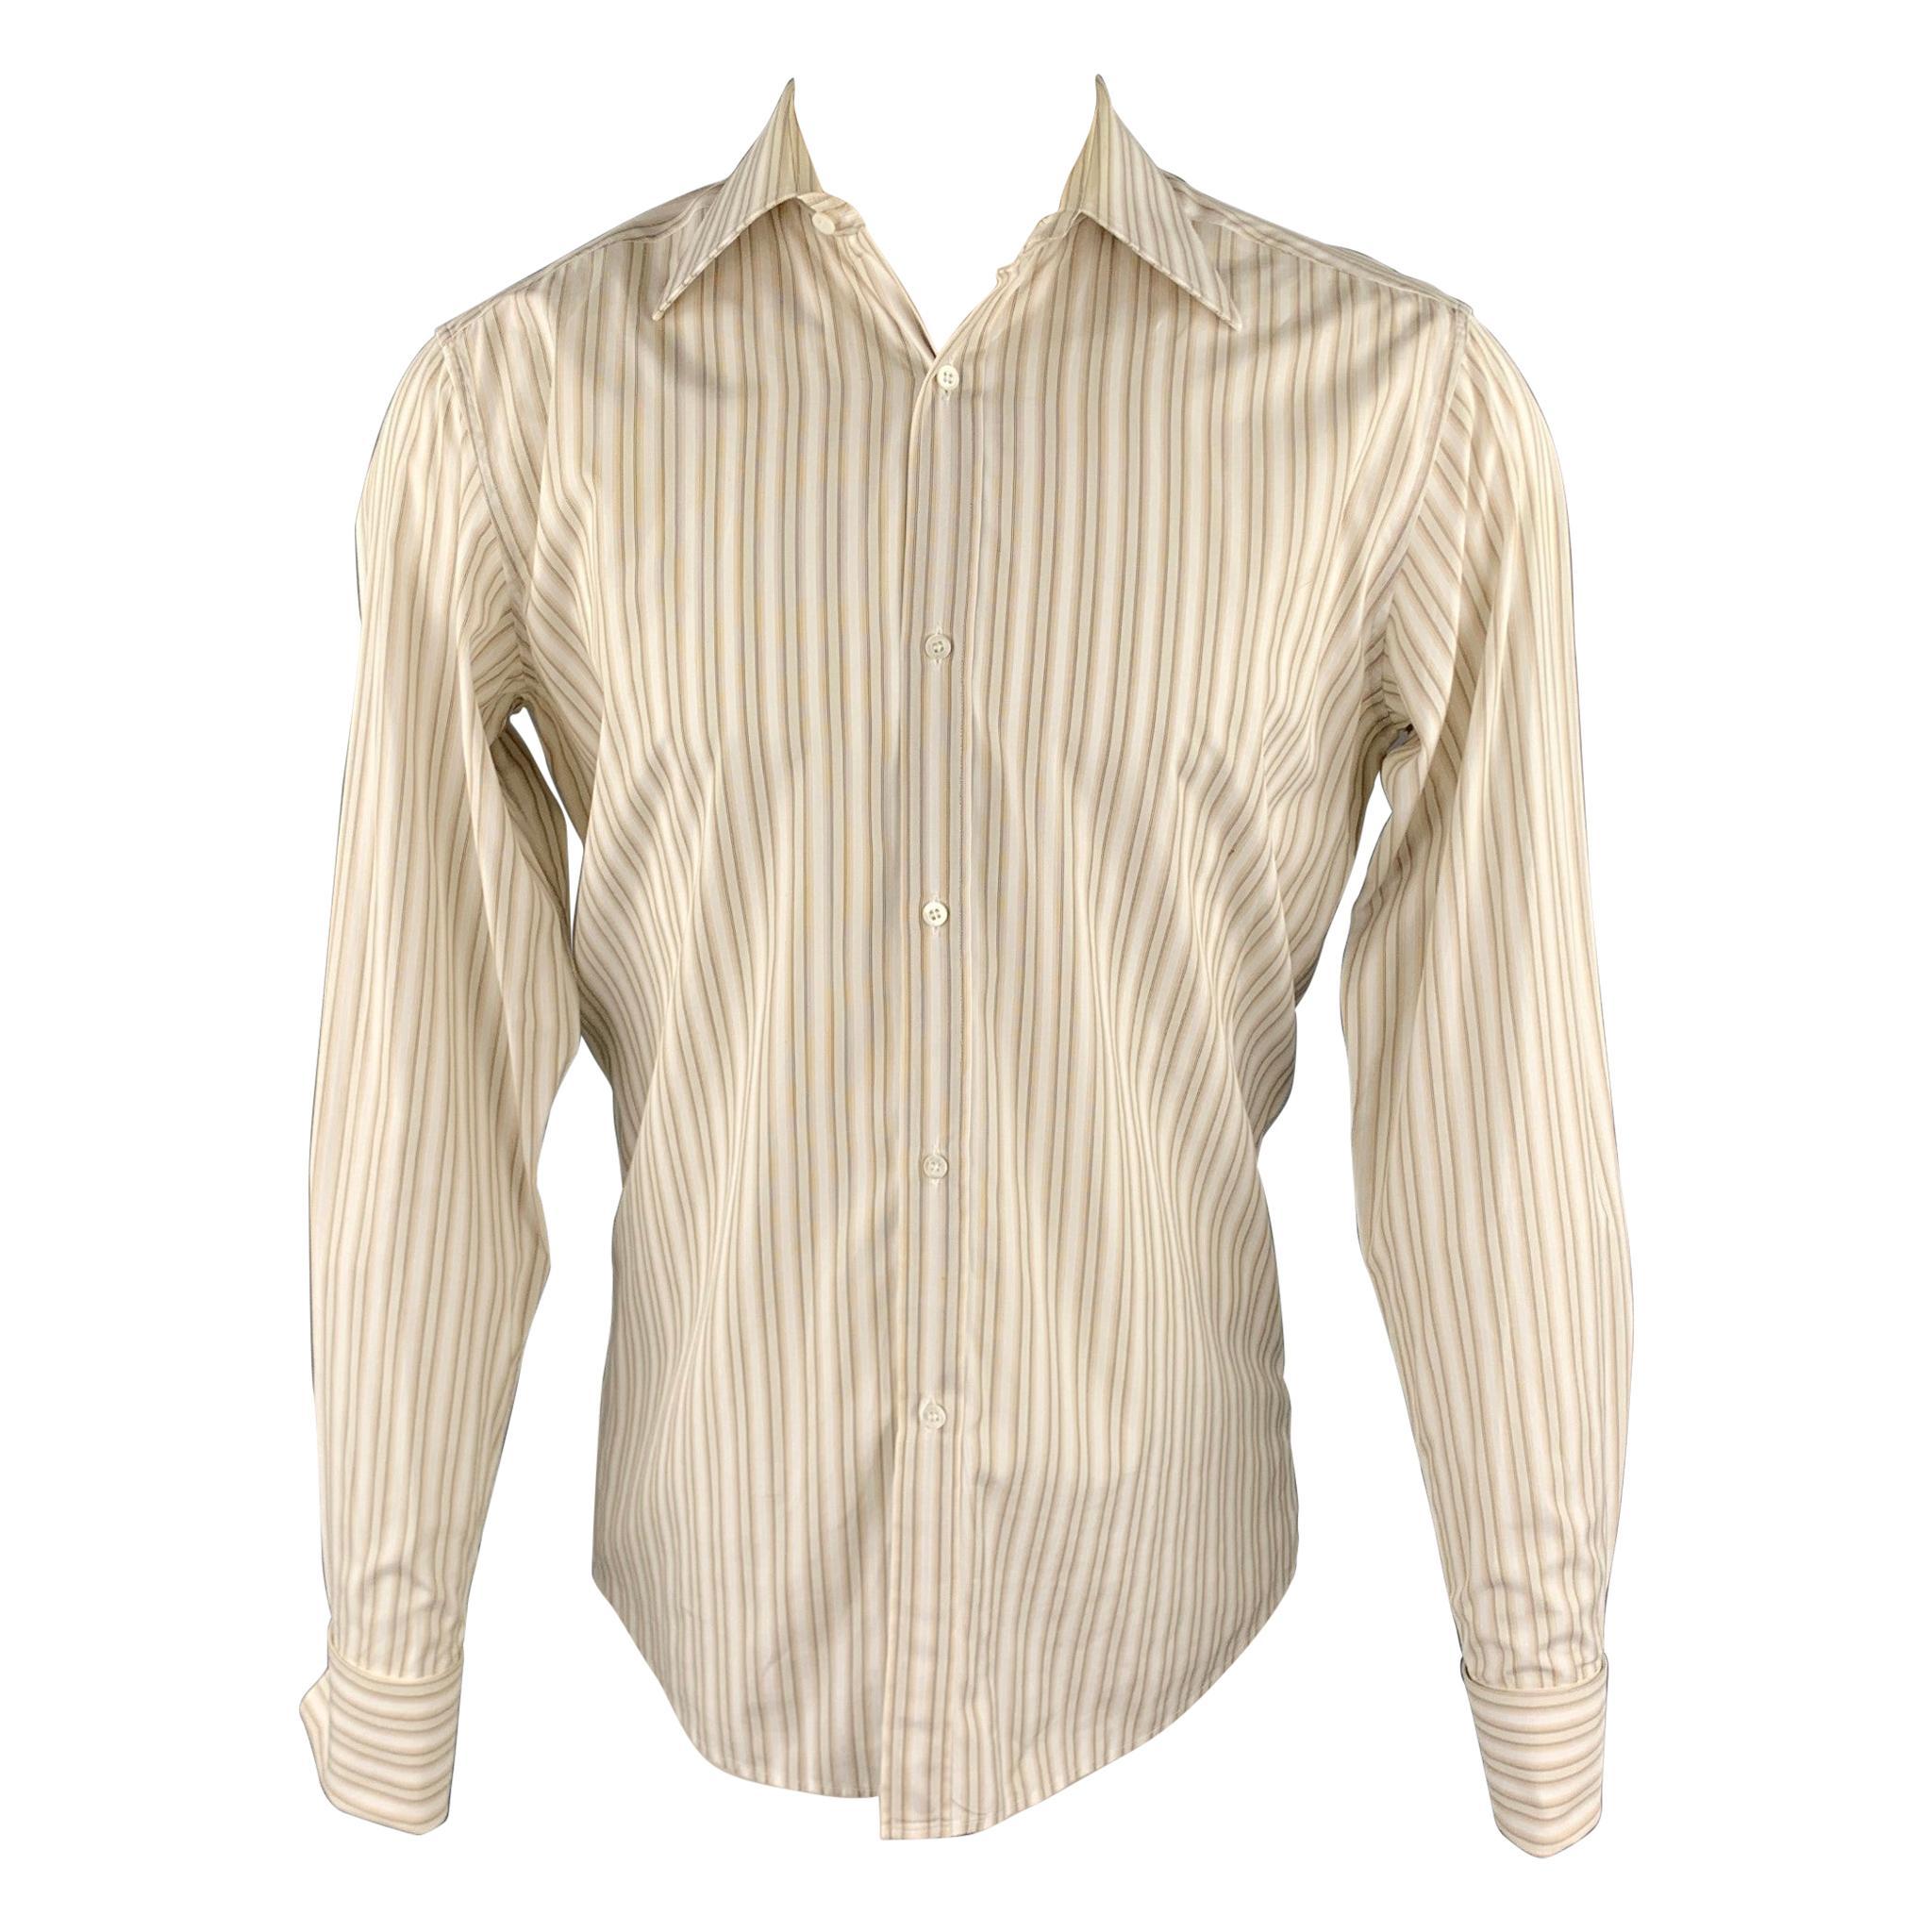 GUCCI Size M Beige Stripe Cotton French Cuff Long Sleeve Shirt